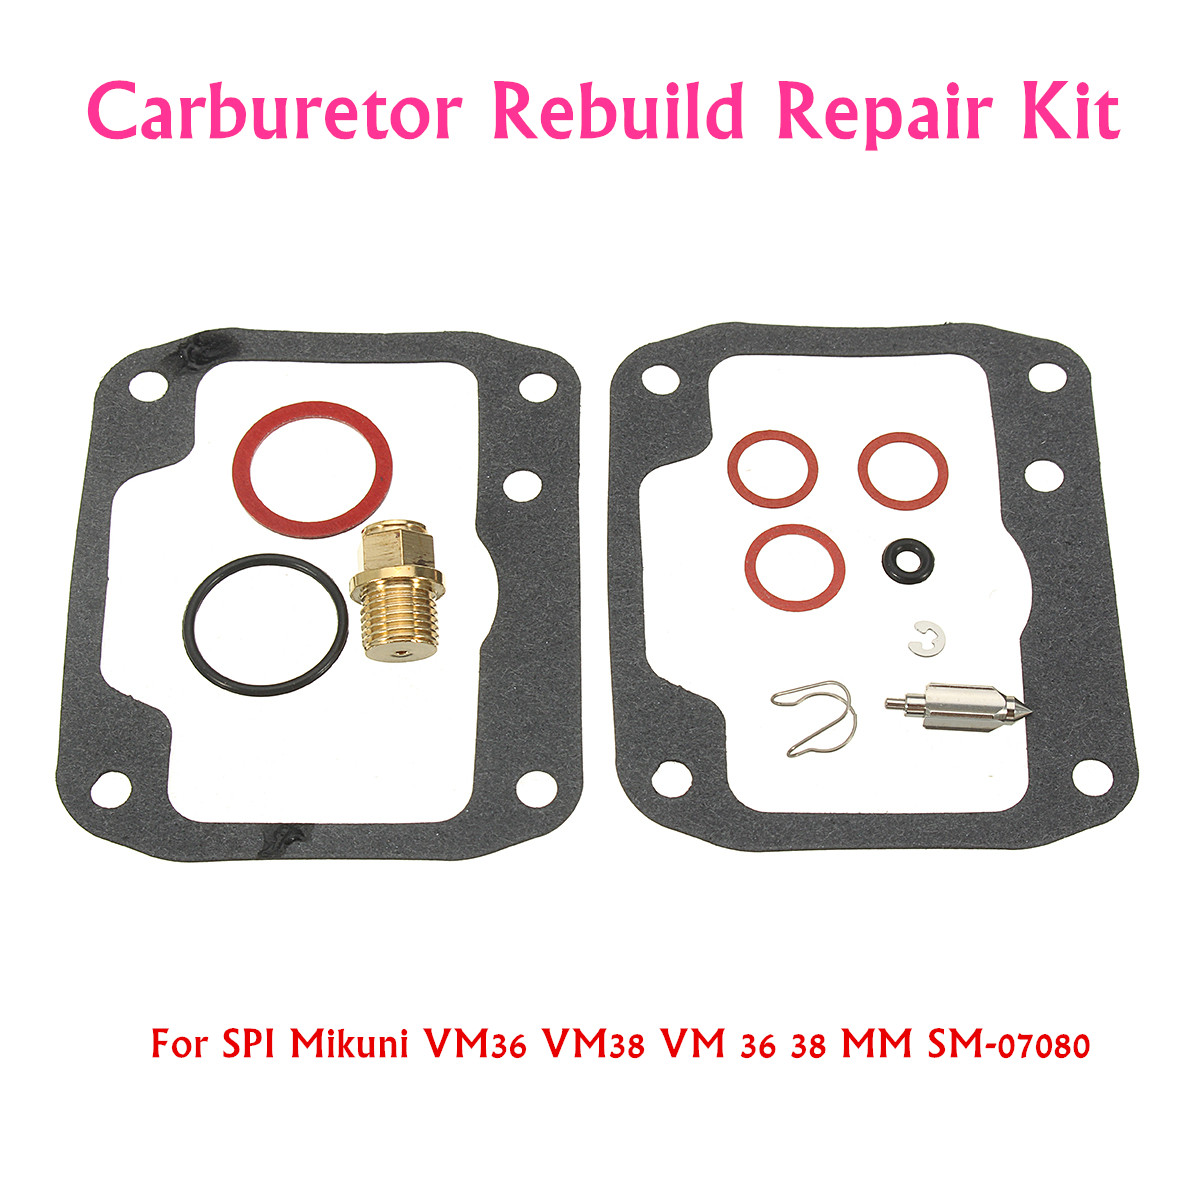 Carburetor Rebuild Repair Kit For SPI Mikuni VM36 VM38 VM 36 38 MM SM-07080